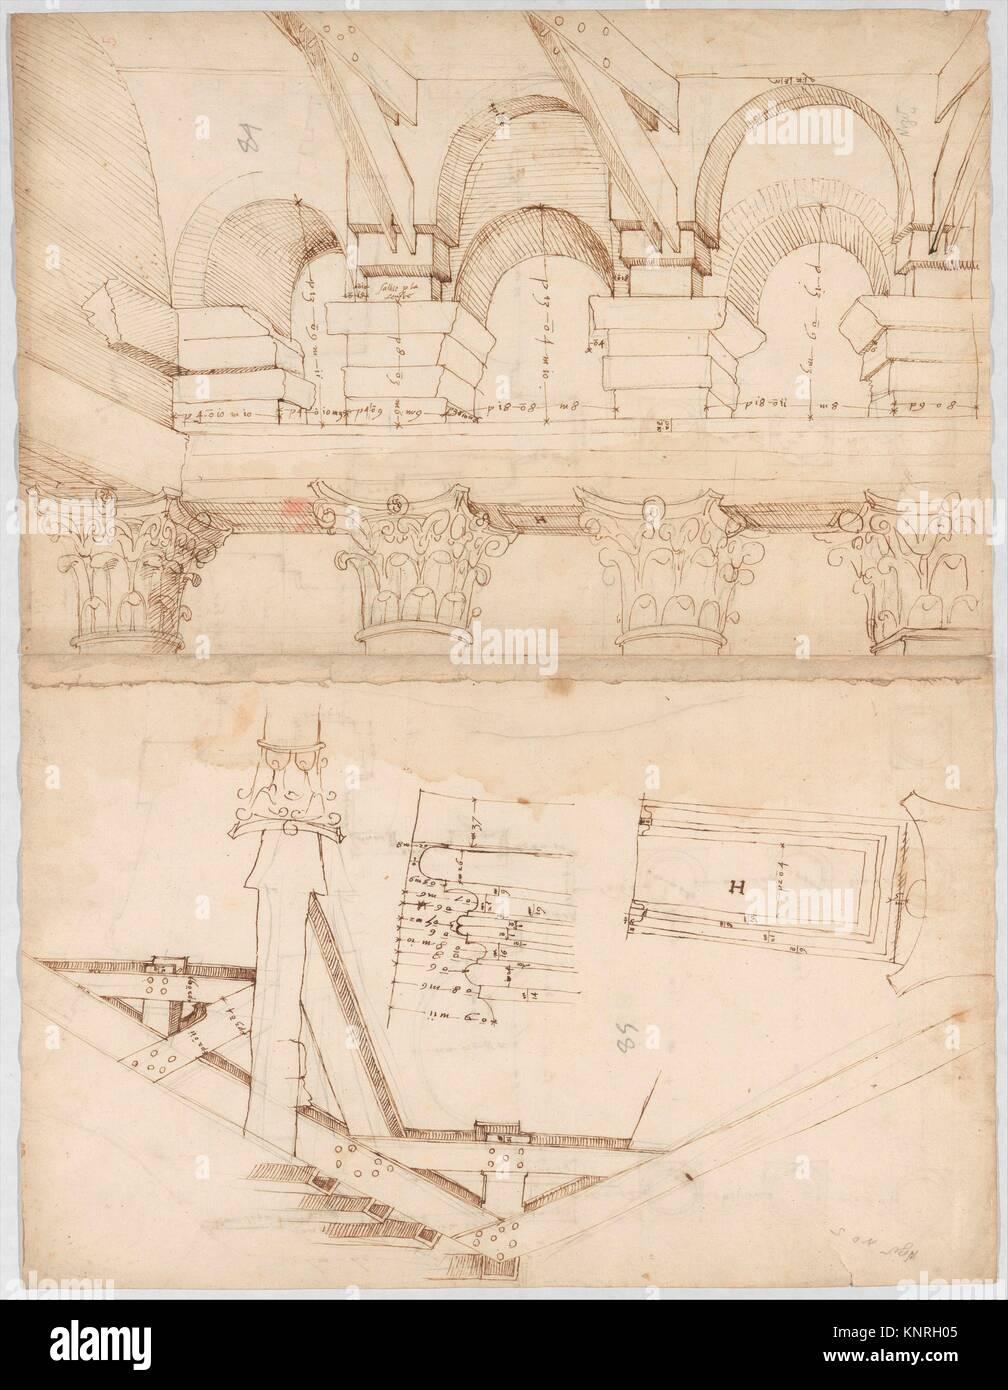 Pantheon, Portikus, Plan (recto) Pantheon, Portikus, Details und Perspektive (verso). Serie/Portfolio: Goldschmidt Stockbild